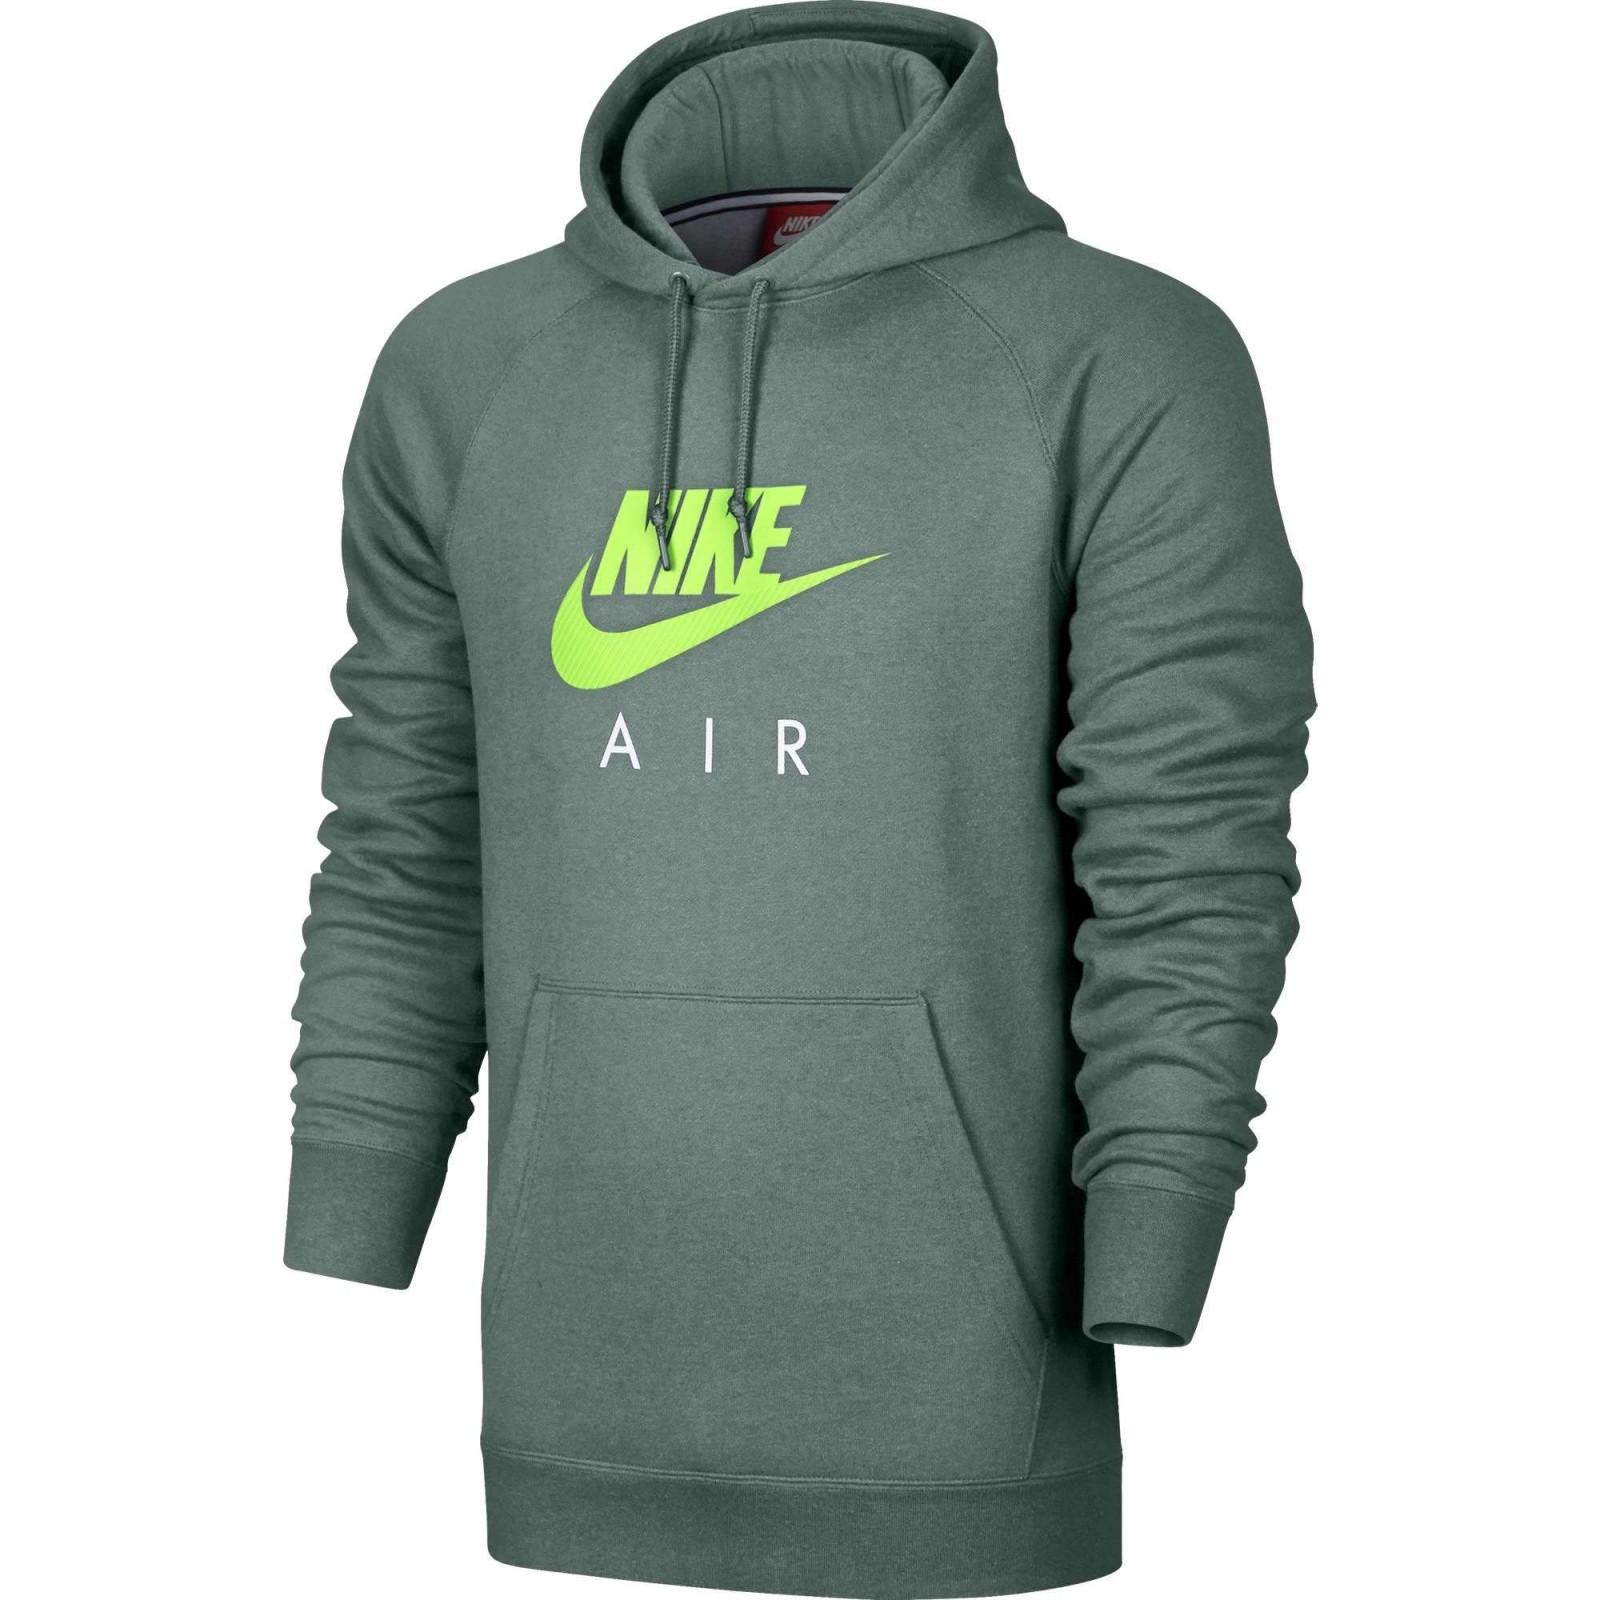 4ac8f7ee1e03 Pánská mikina Nike M NSW HOODIE PO FLC AIR HRTG